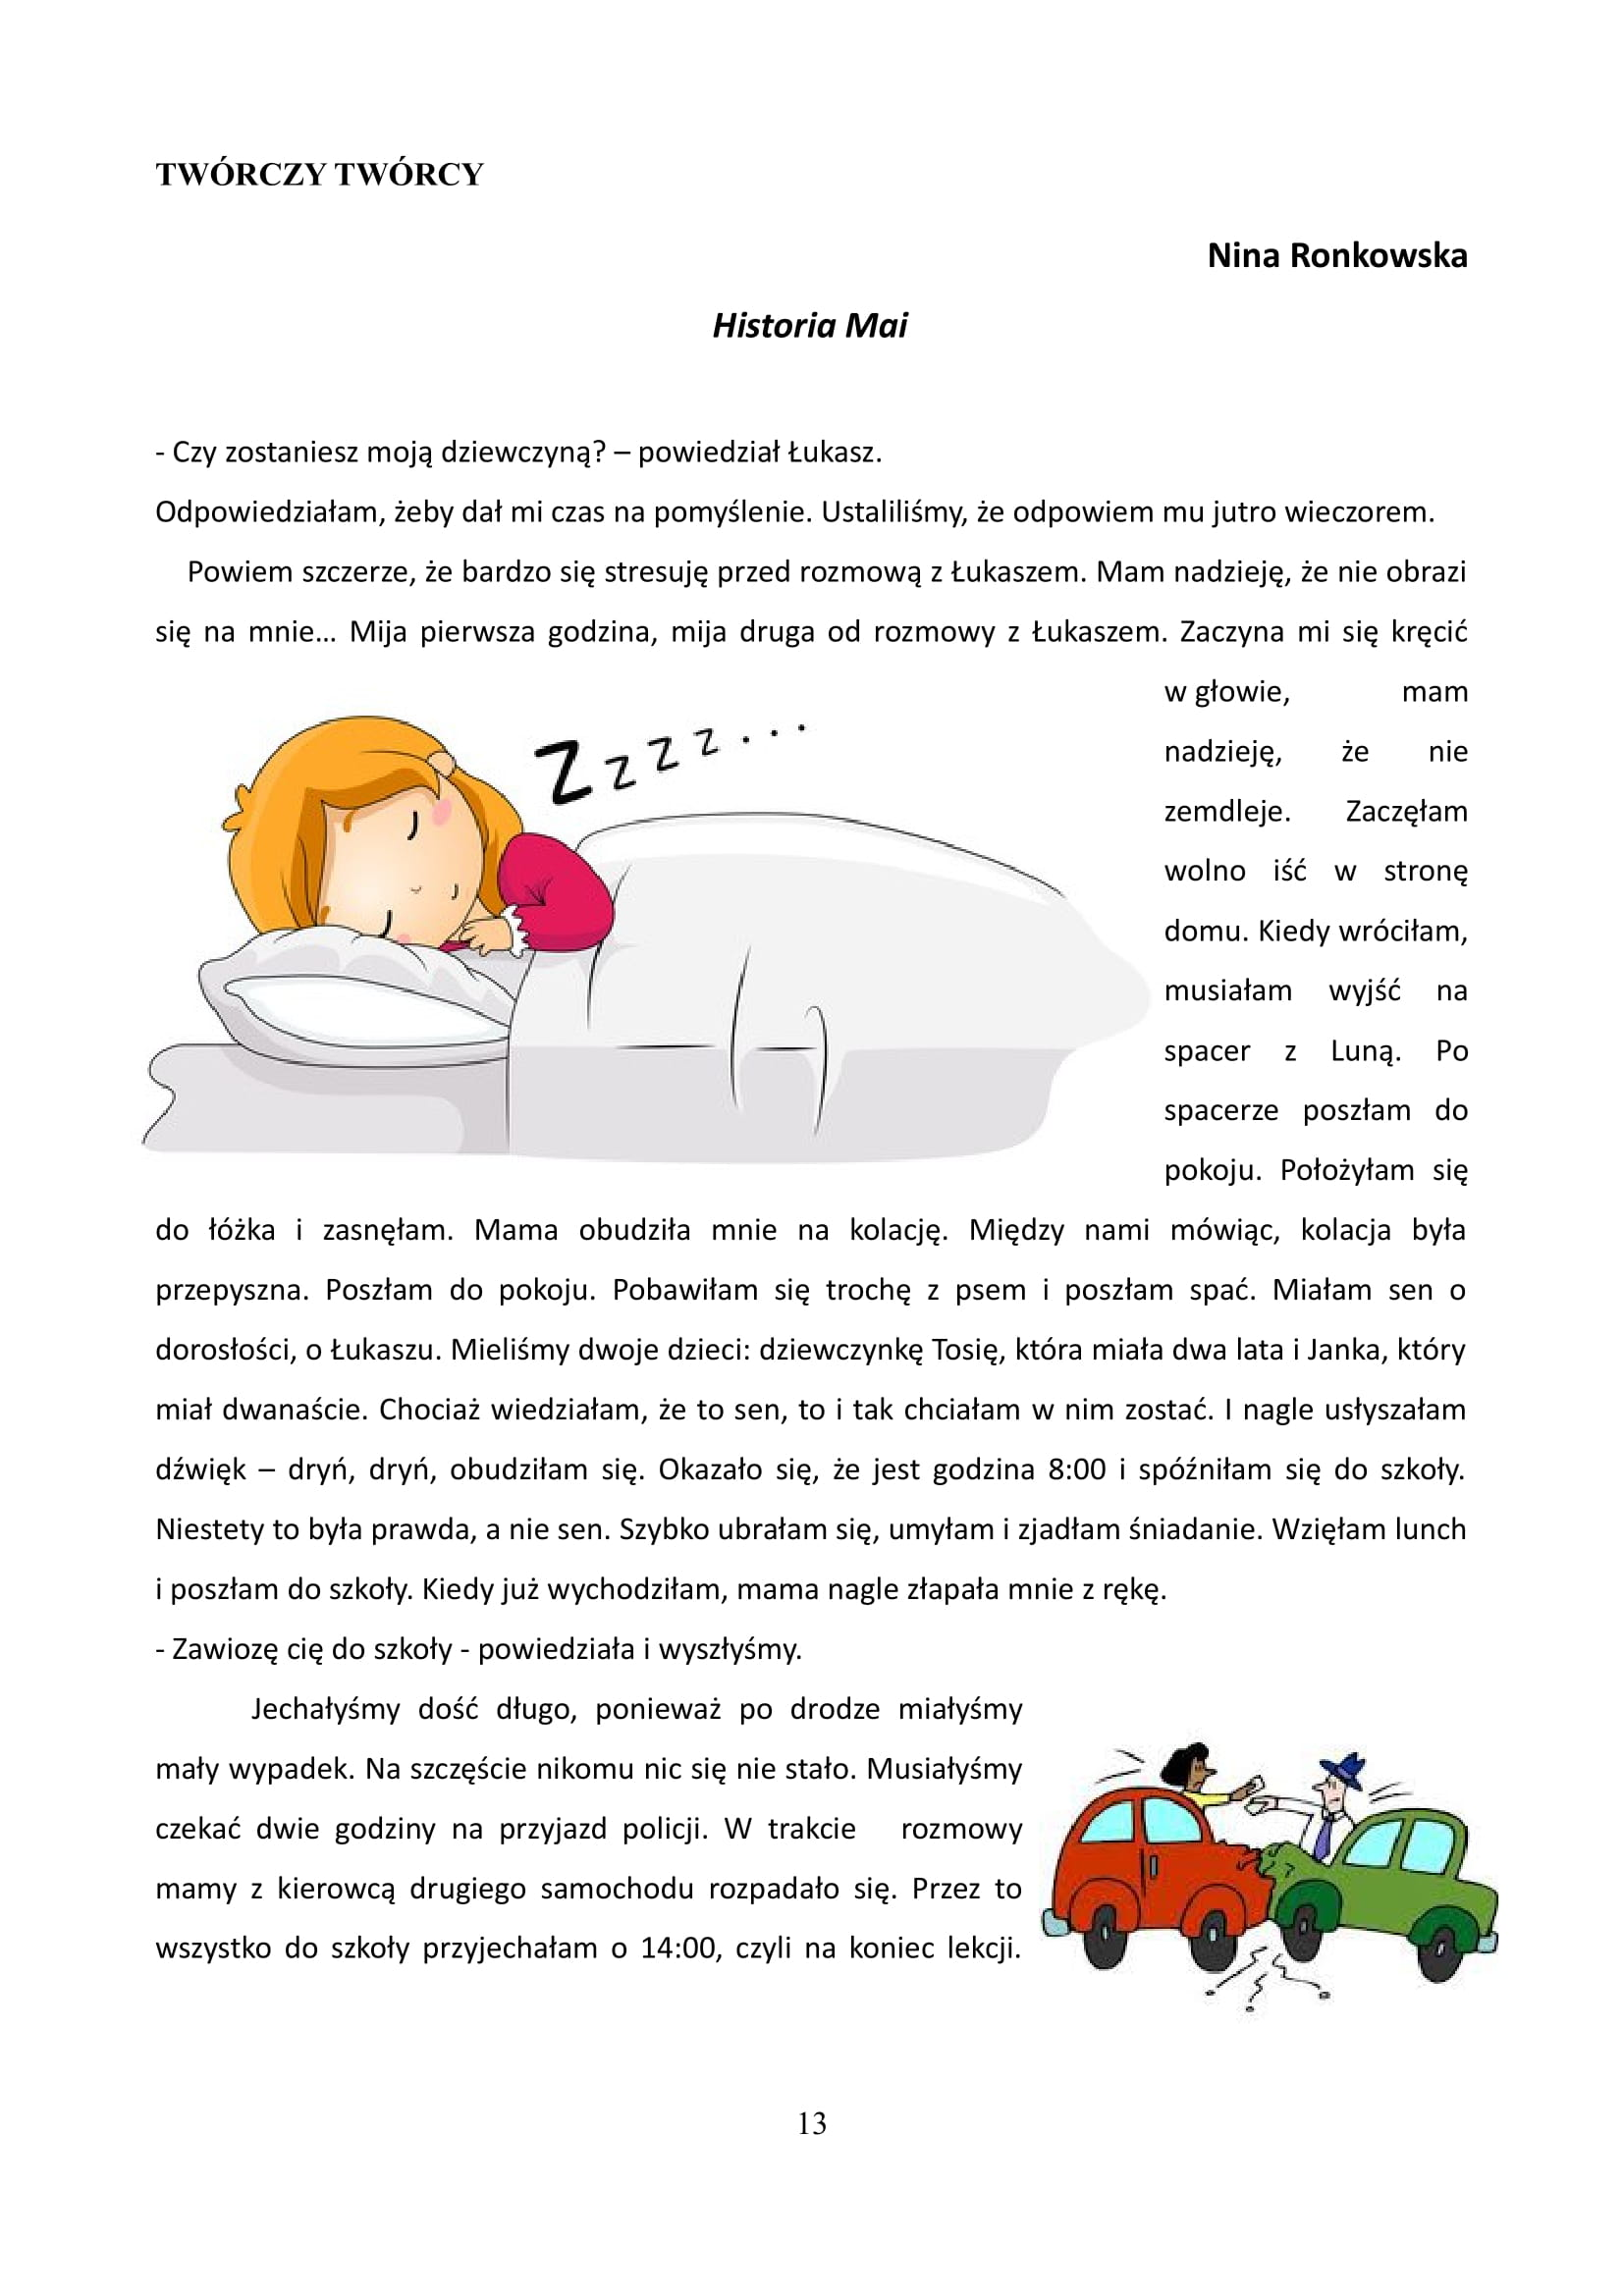 http://sp24sto.edu.pl/wp-content/uploads/sites/3/2018/02/Gazeta-4-2016.2017-13.jpg